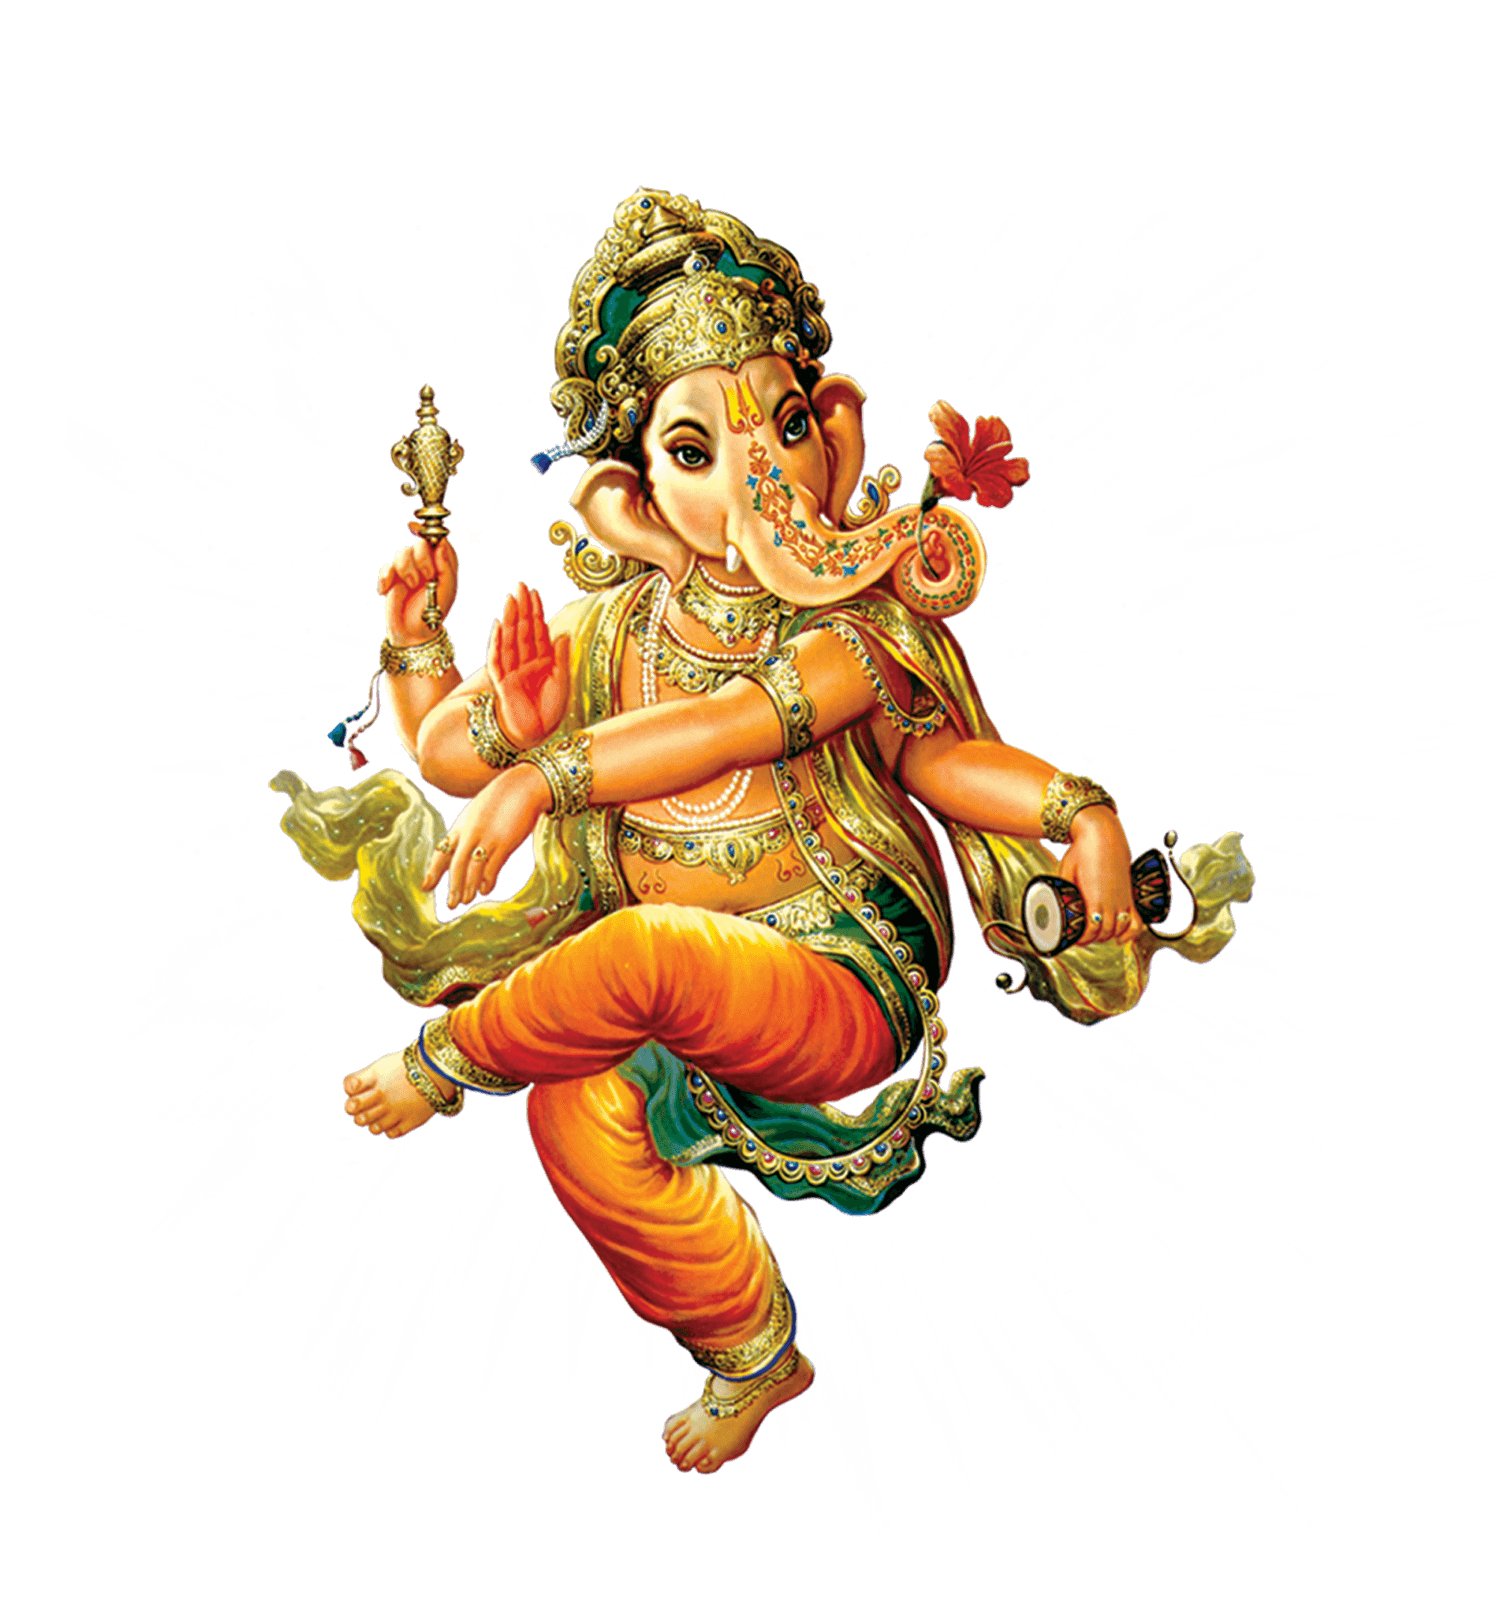 Sri Ganesh Solo (With images) Ganesha, Ganesh, Indian art